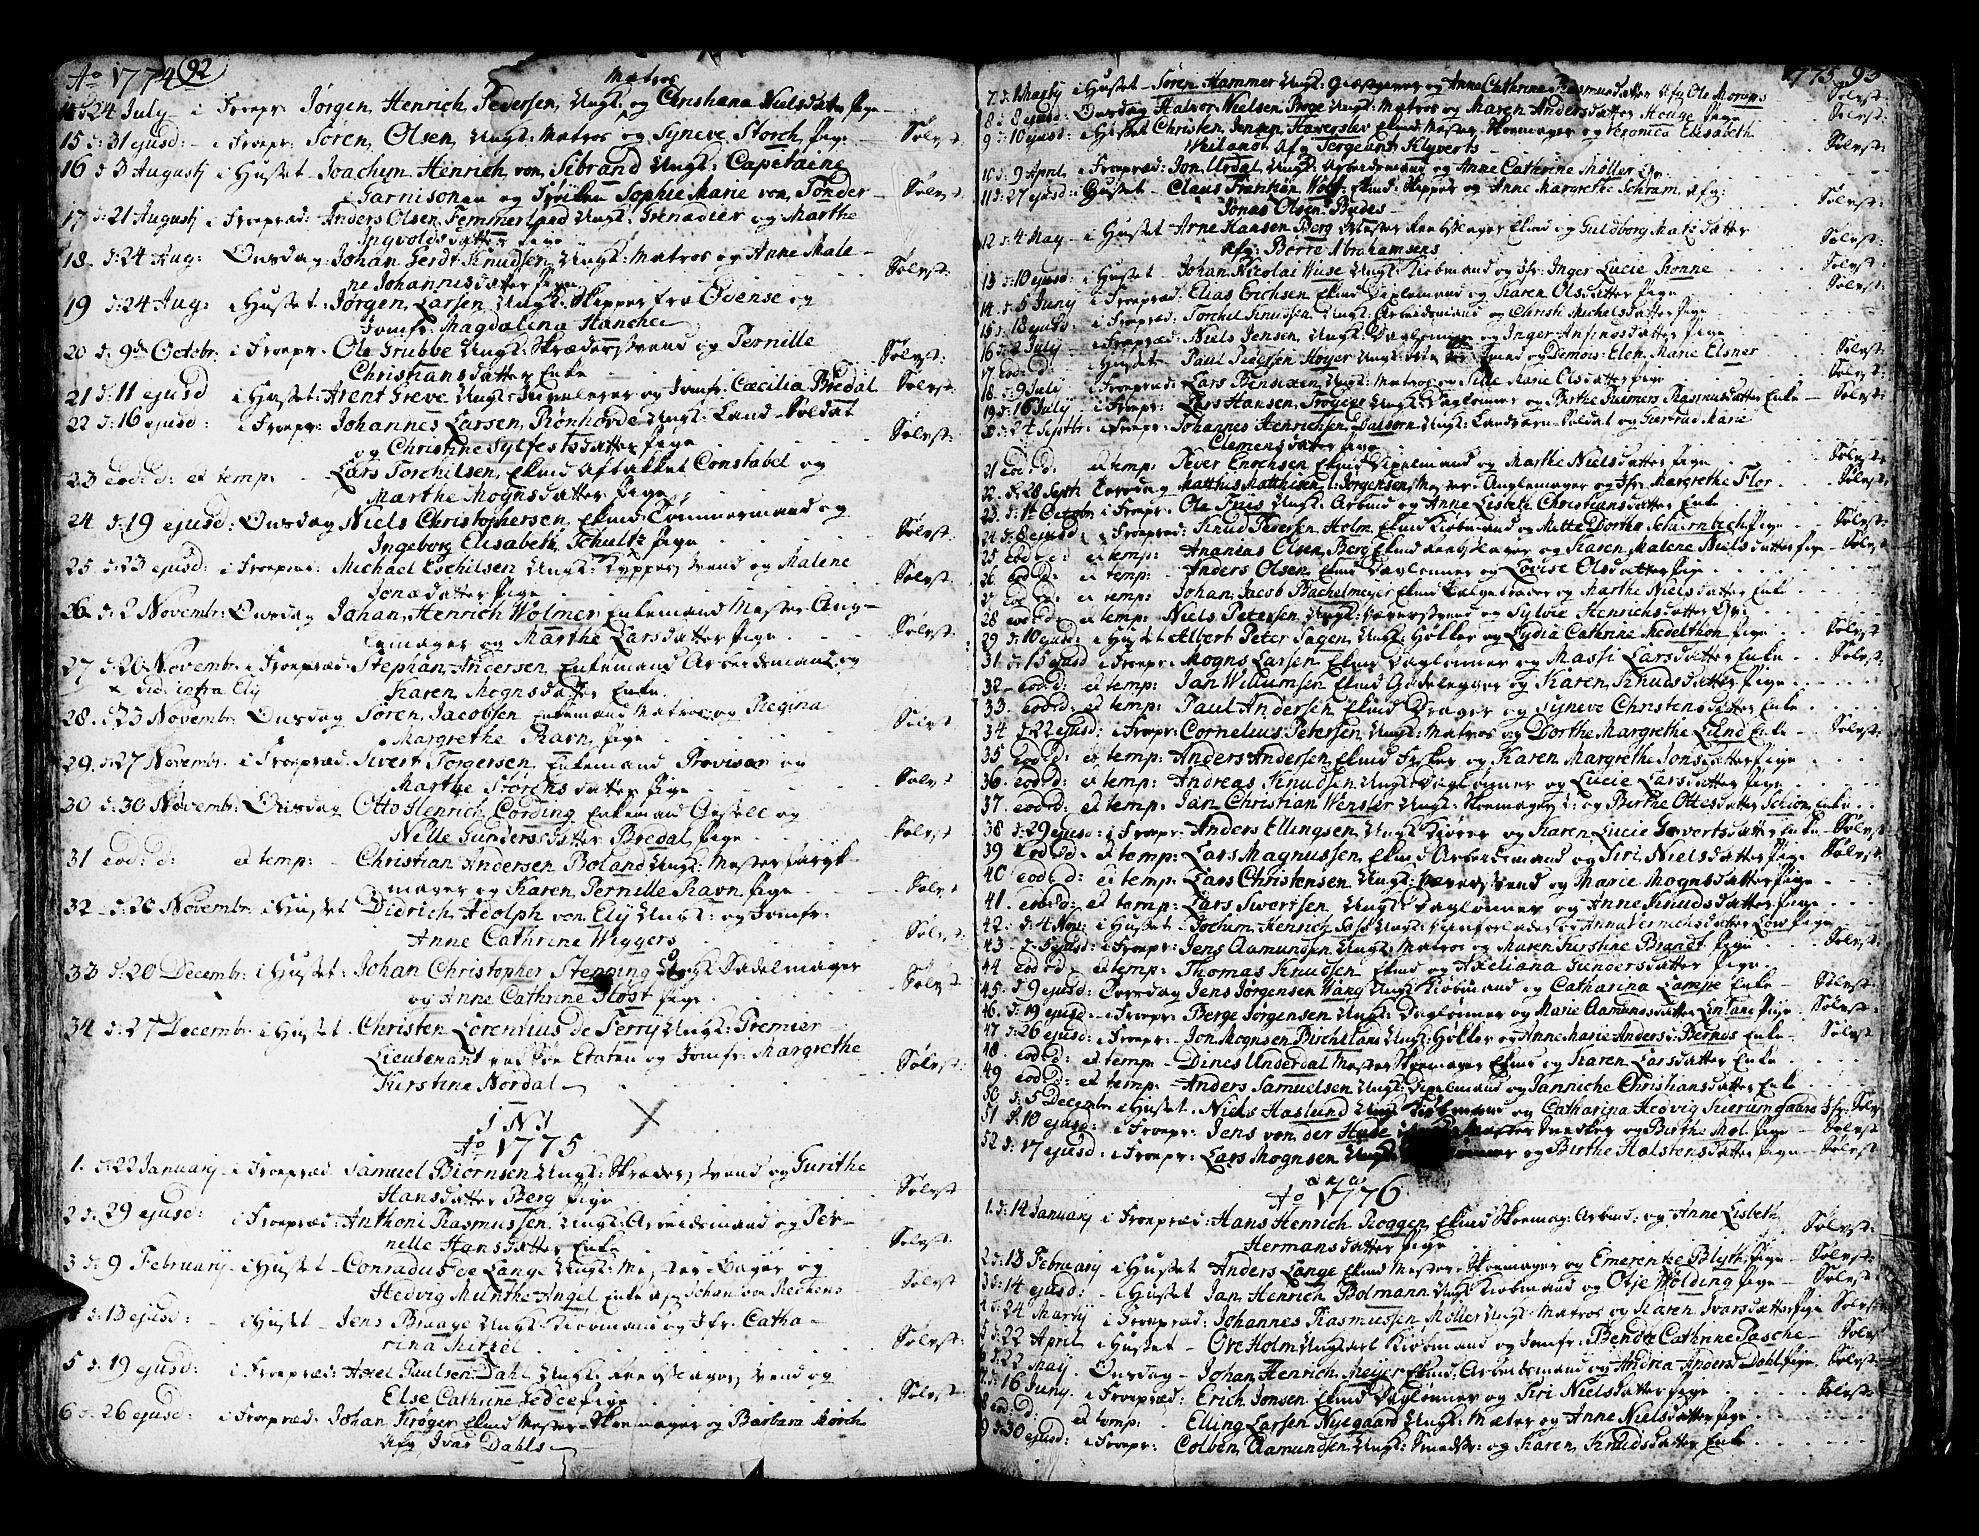 SAB, Domkirken Sokneprestembete, H/Haa/L0007: Ministerialbok nr. A 7, 1725-1826, s. 92-93